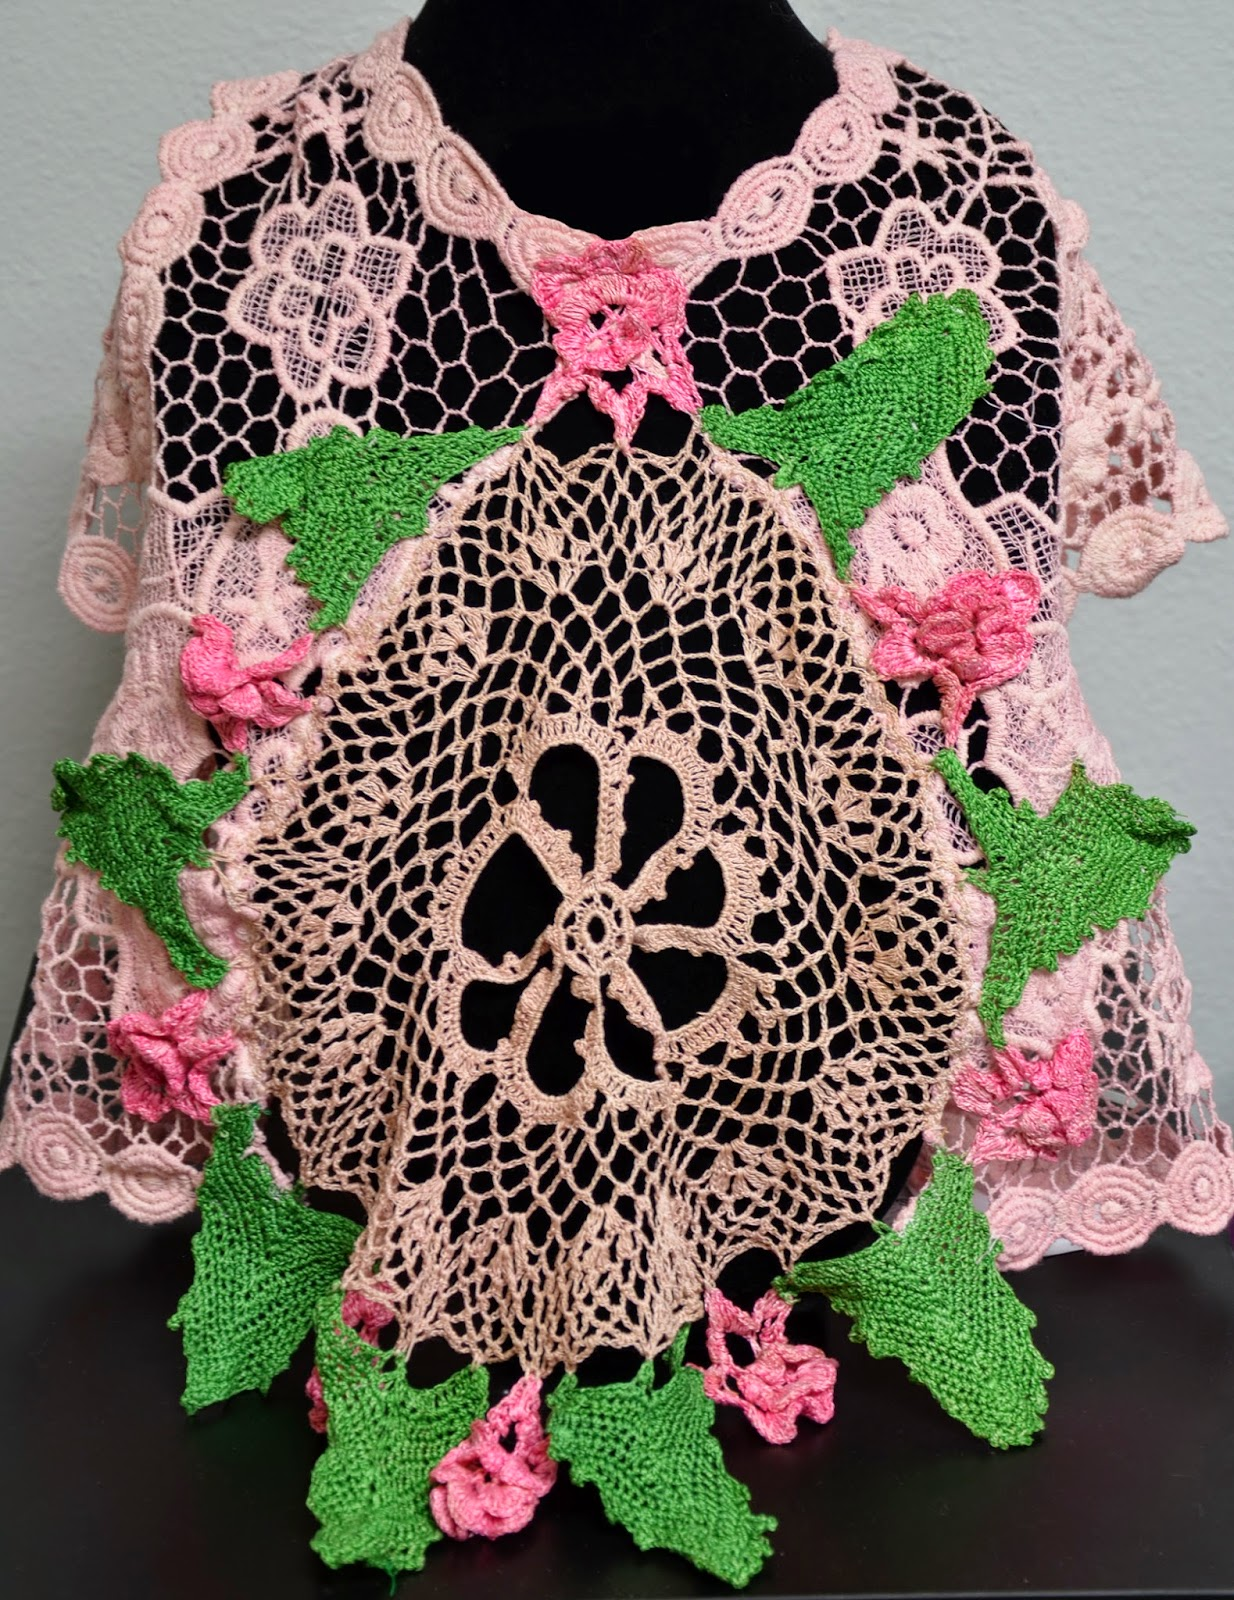 Handmade Lace Shawl